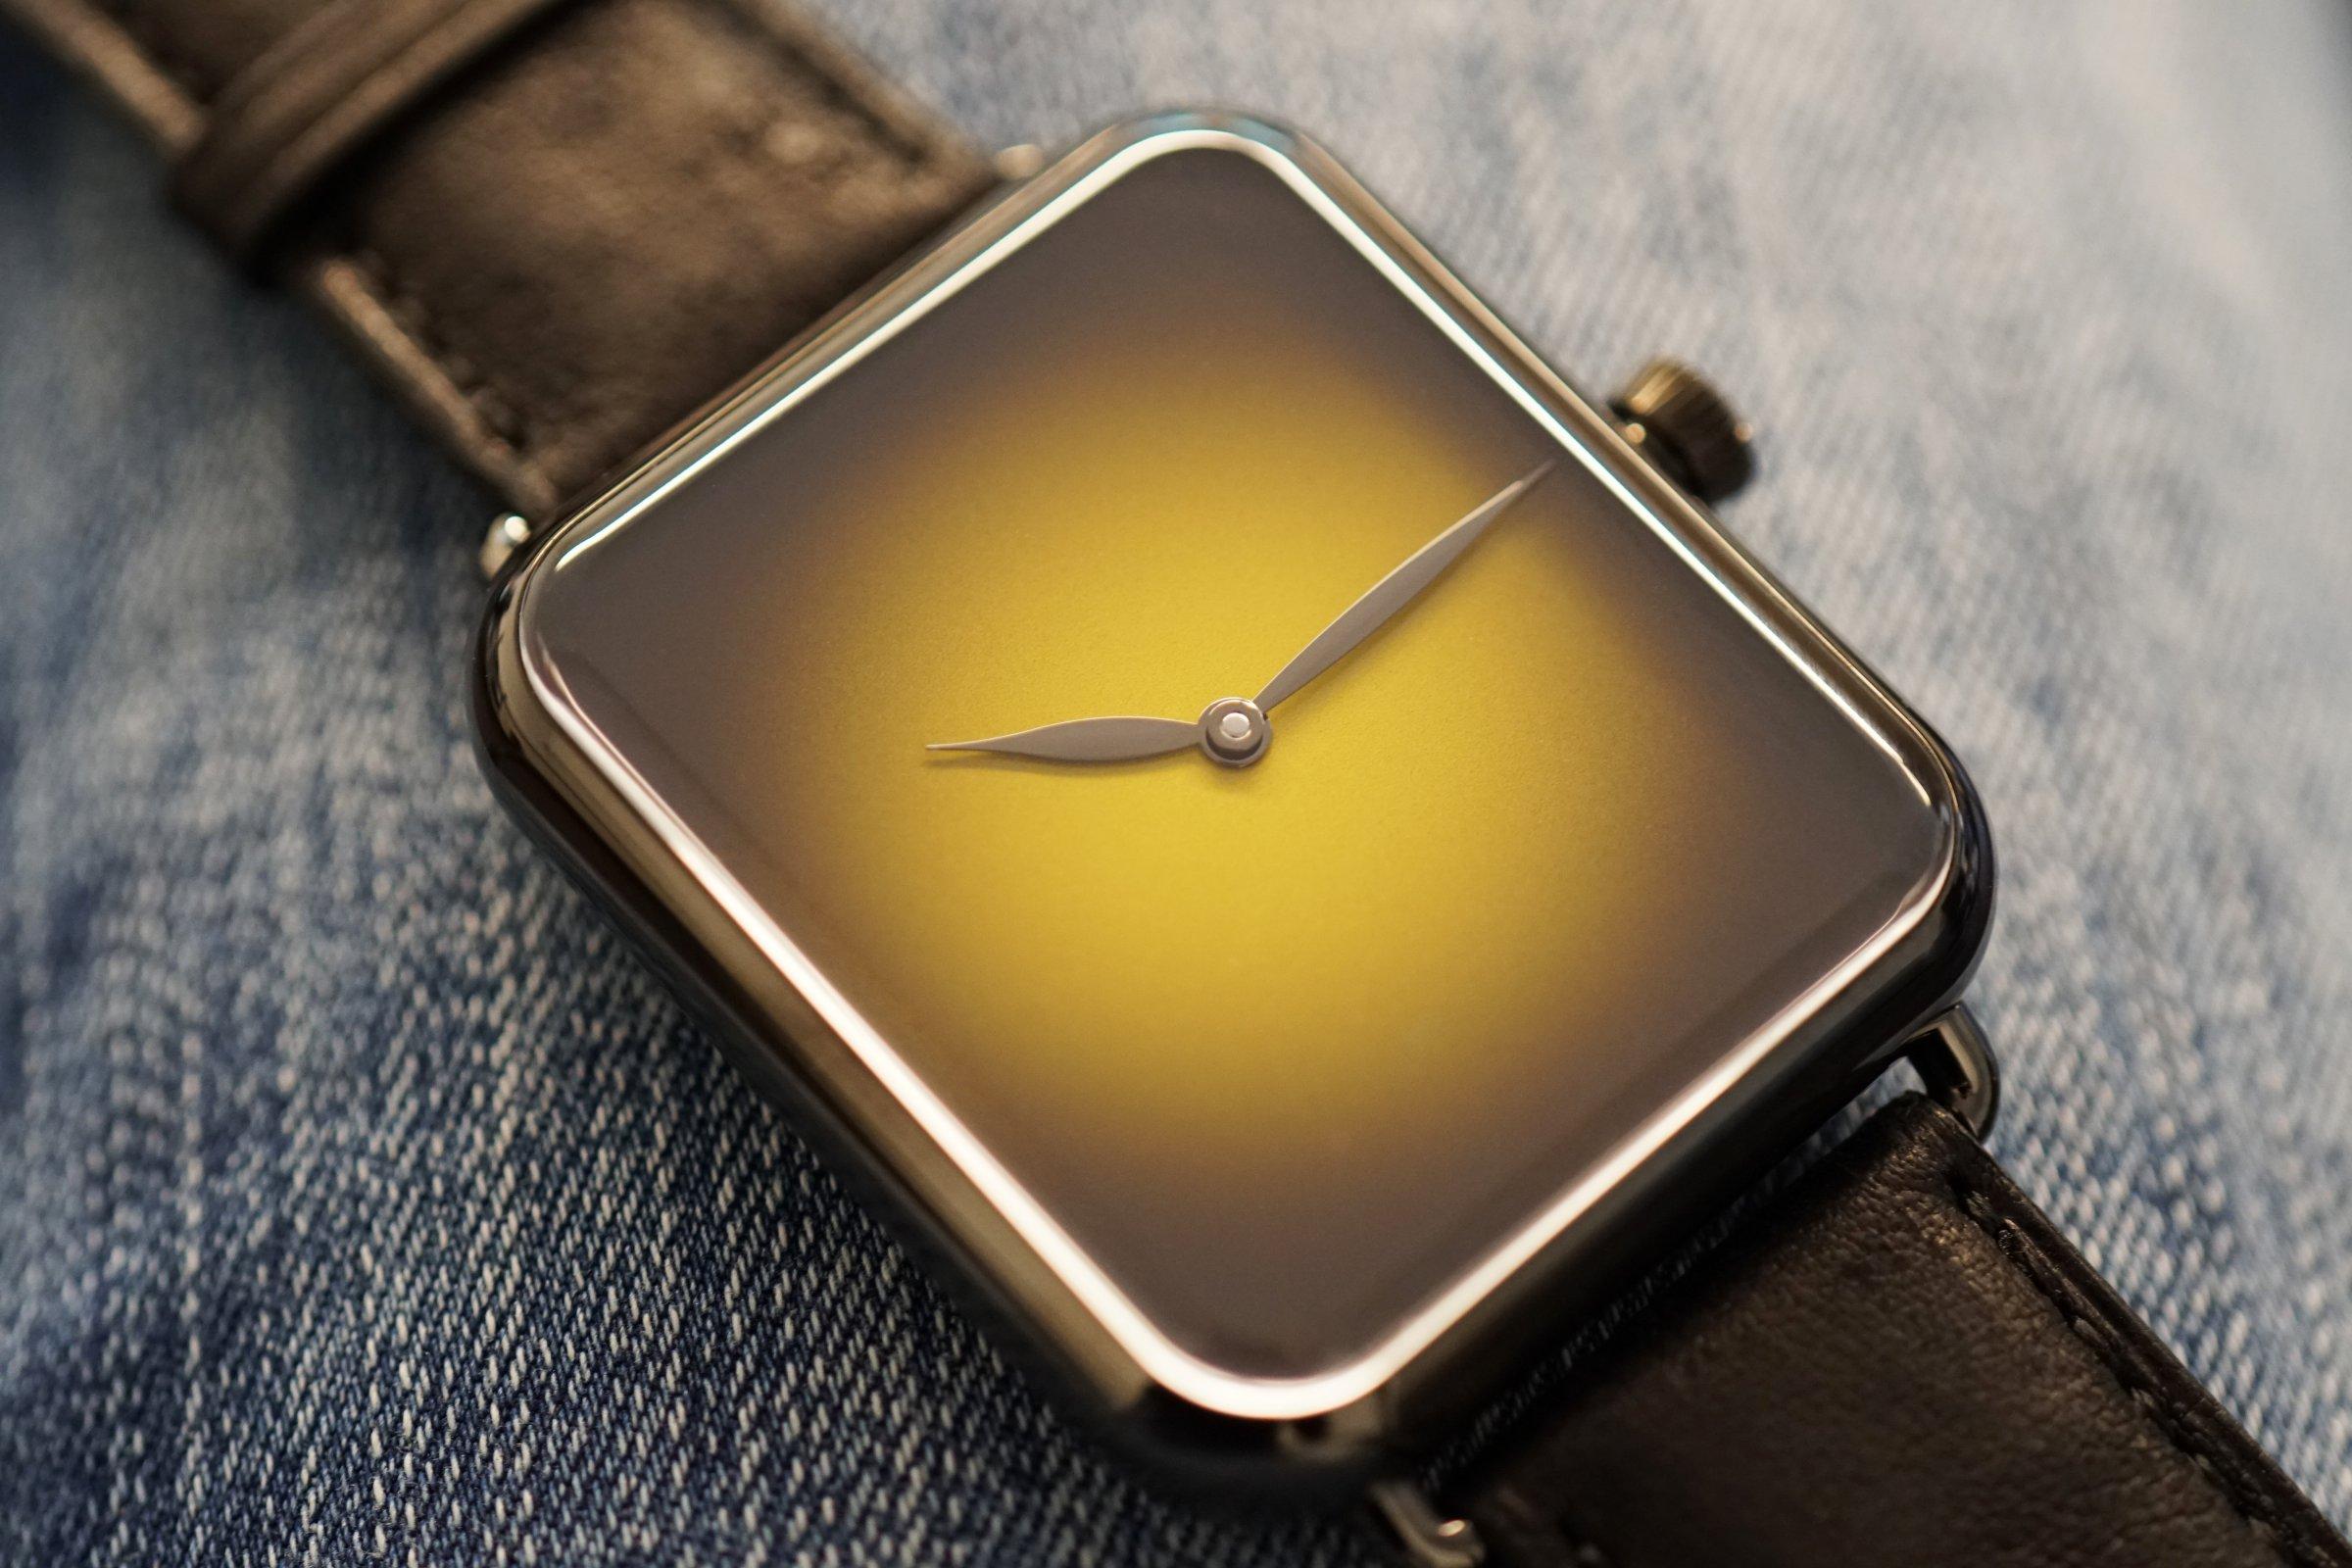 swiss_alp_watch_concept_dubai_limited_edition_5324-1204_lifestyle01.jpg